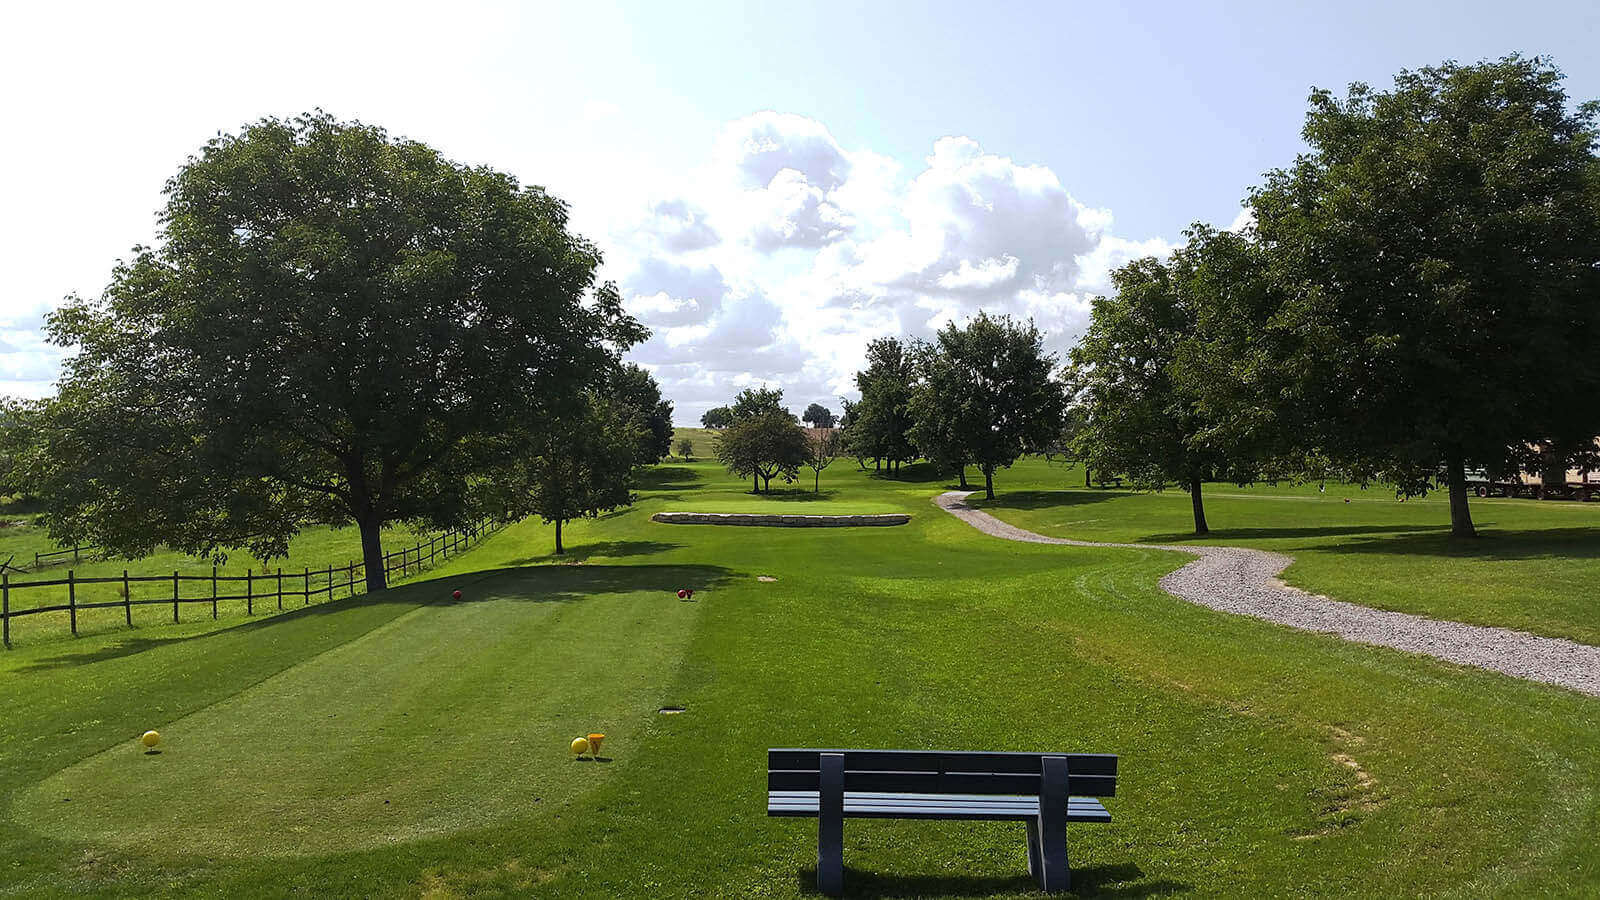 Golfpark-Karlsruhe-Gut-Batzenhof_2